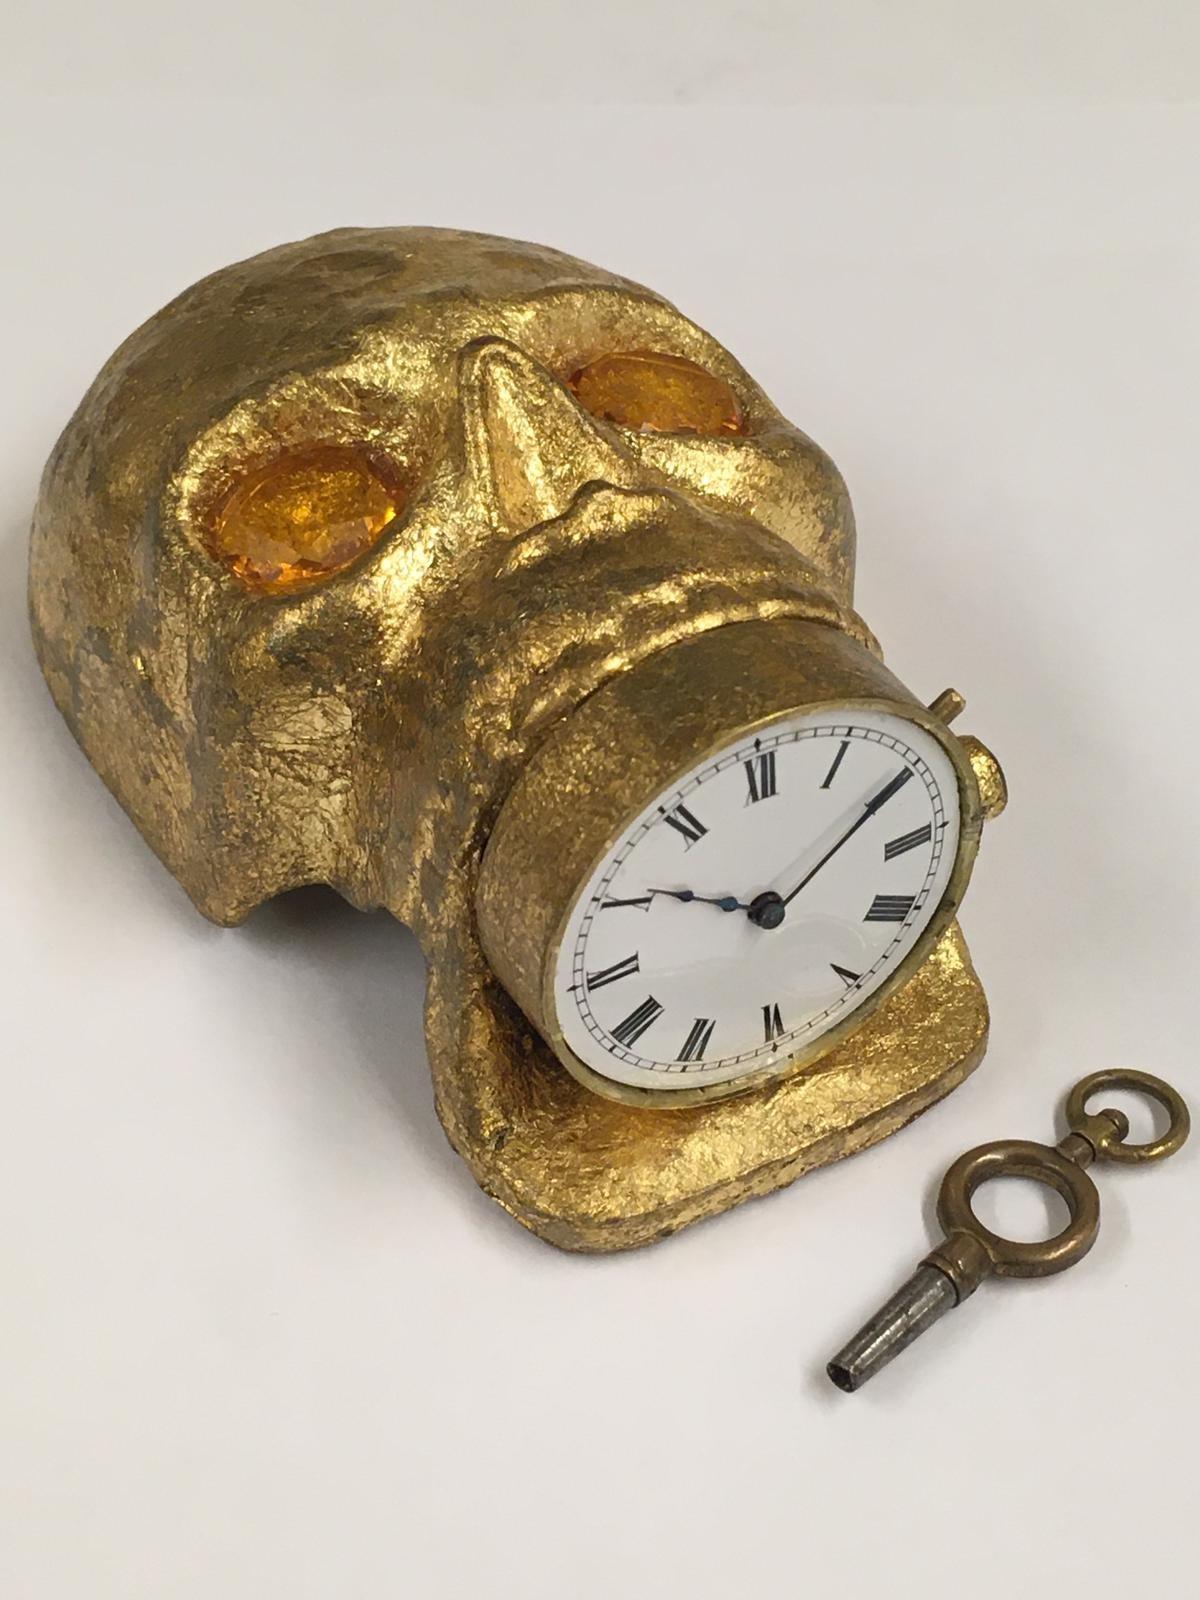 Antique 19th century Masonic memento mori Pocket watch movement timepiece . ( working ) skull with